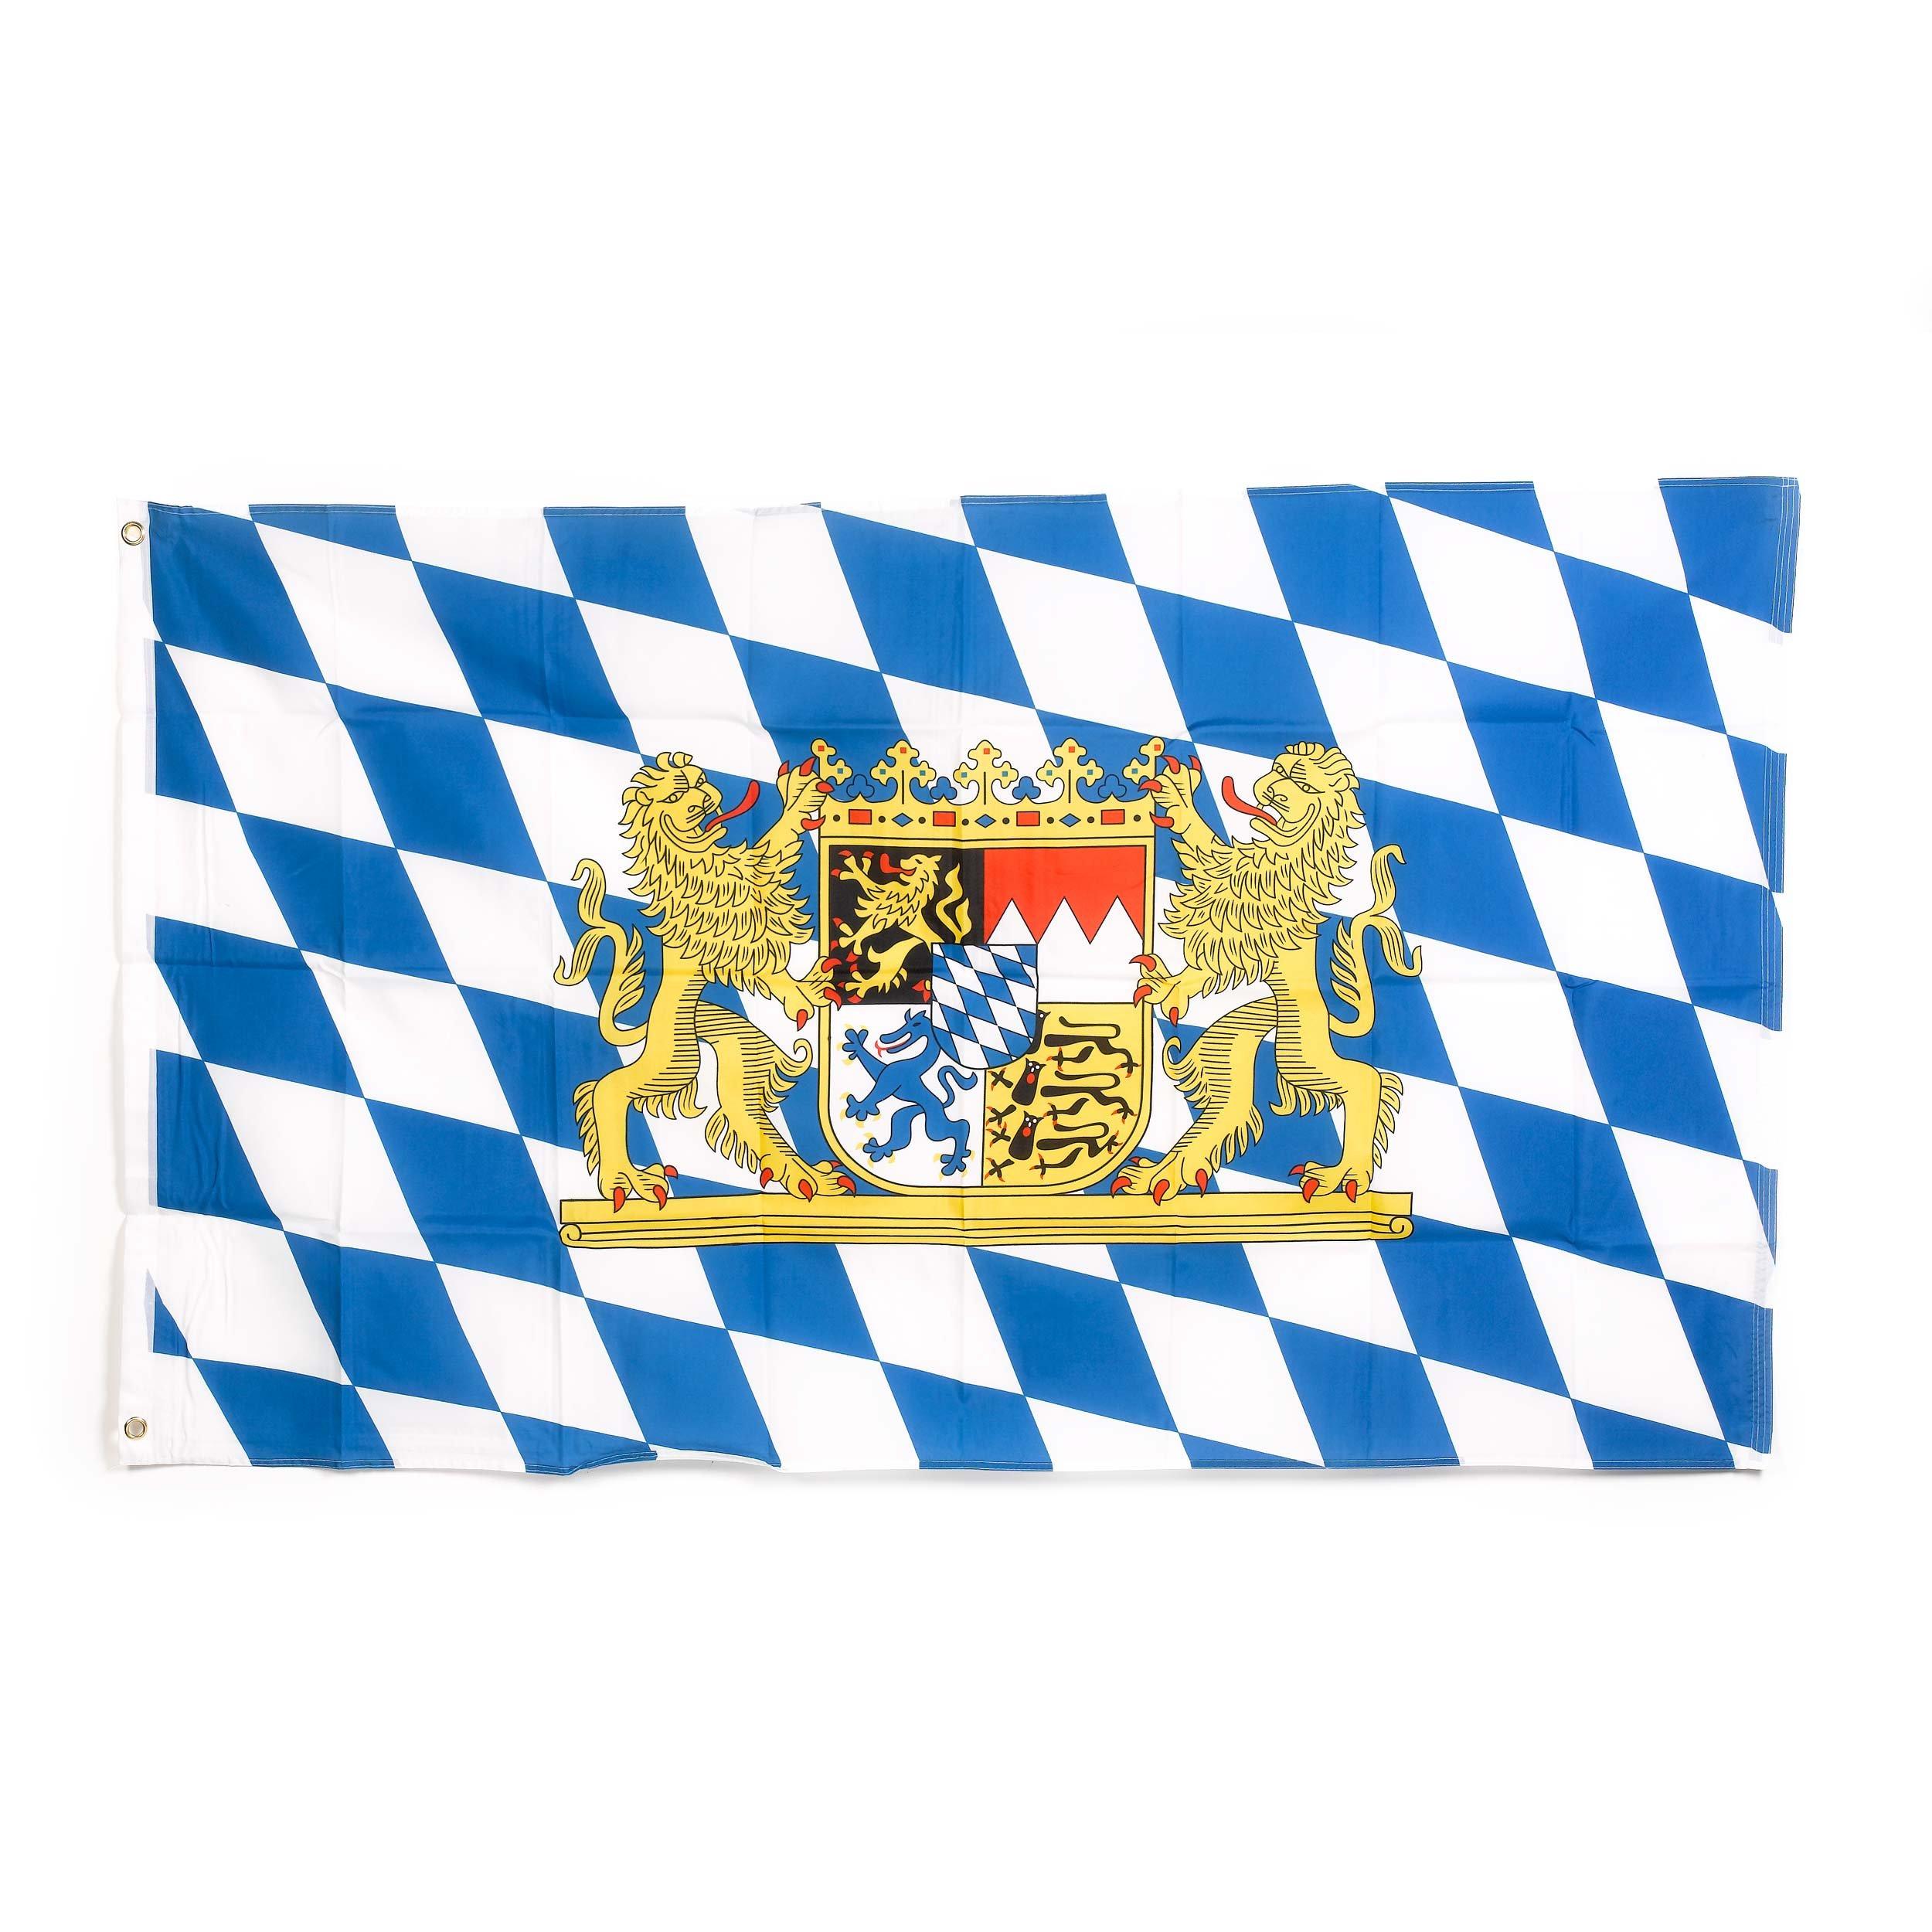 Oktoberfest Bavarian Check Flag with Lion, 3 x 5 Feet